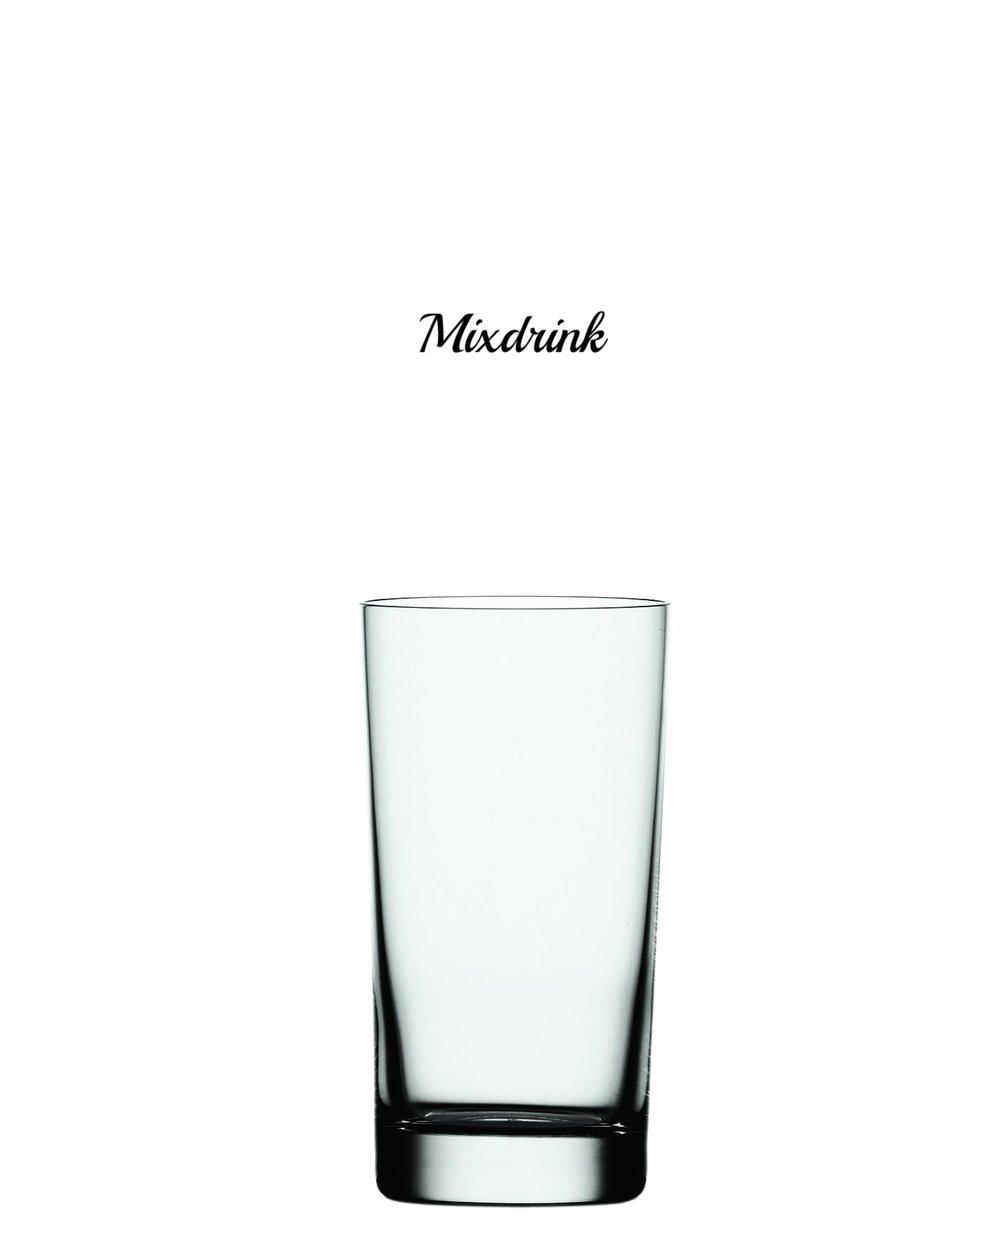 Classic Bar Mixdrink 9008009.jpg